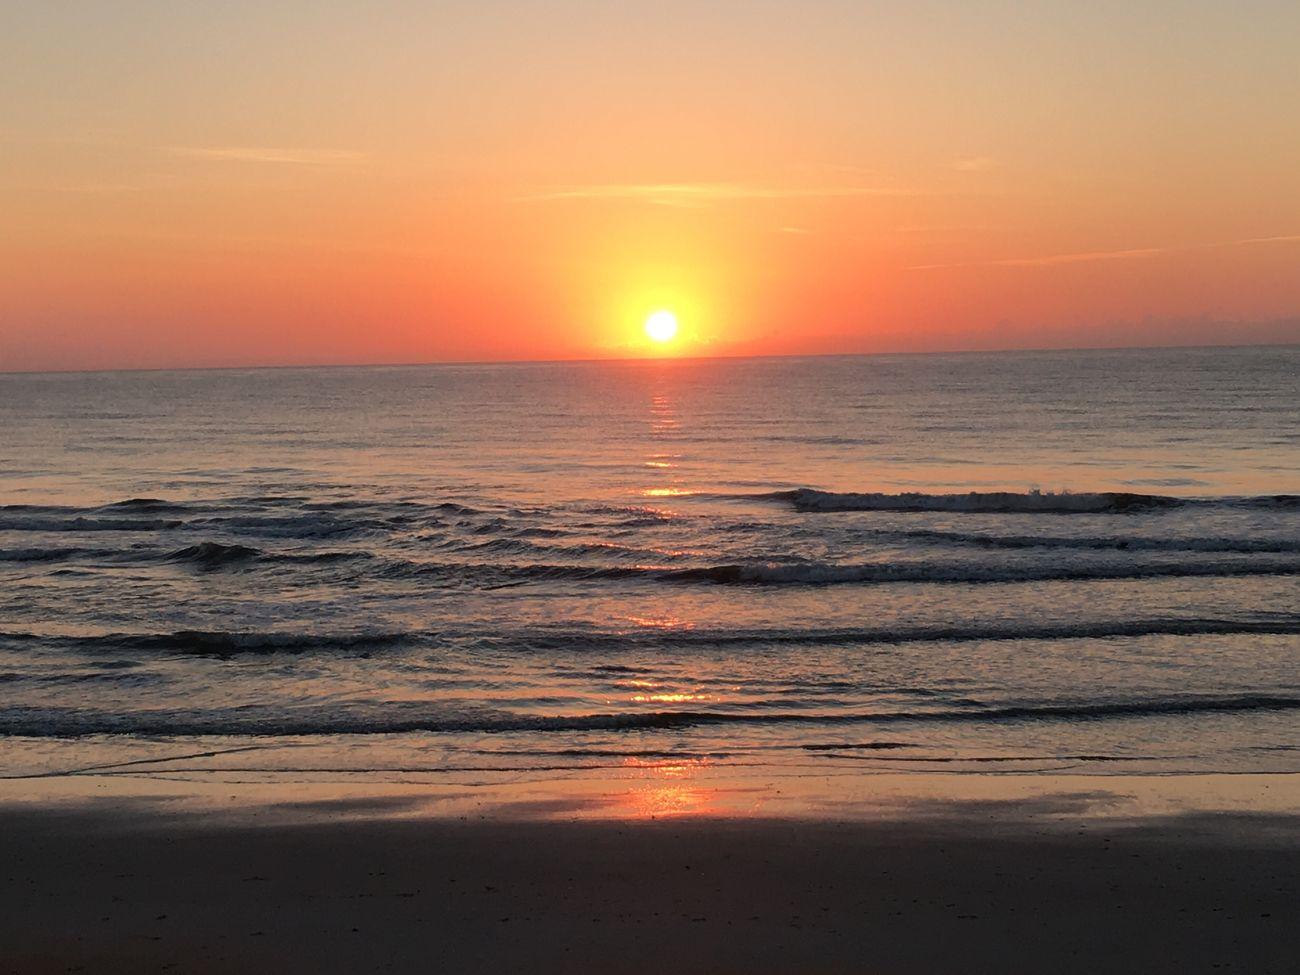 Sunrise at the beach... Beach House EyeEm Best Shots Nature_collection EyeEm Nature Lover EyeEm Best Shots - Nature Connected With Nature Vacation2016 Eye4photography  Eyeem Photo